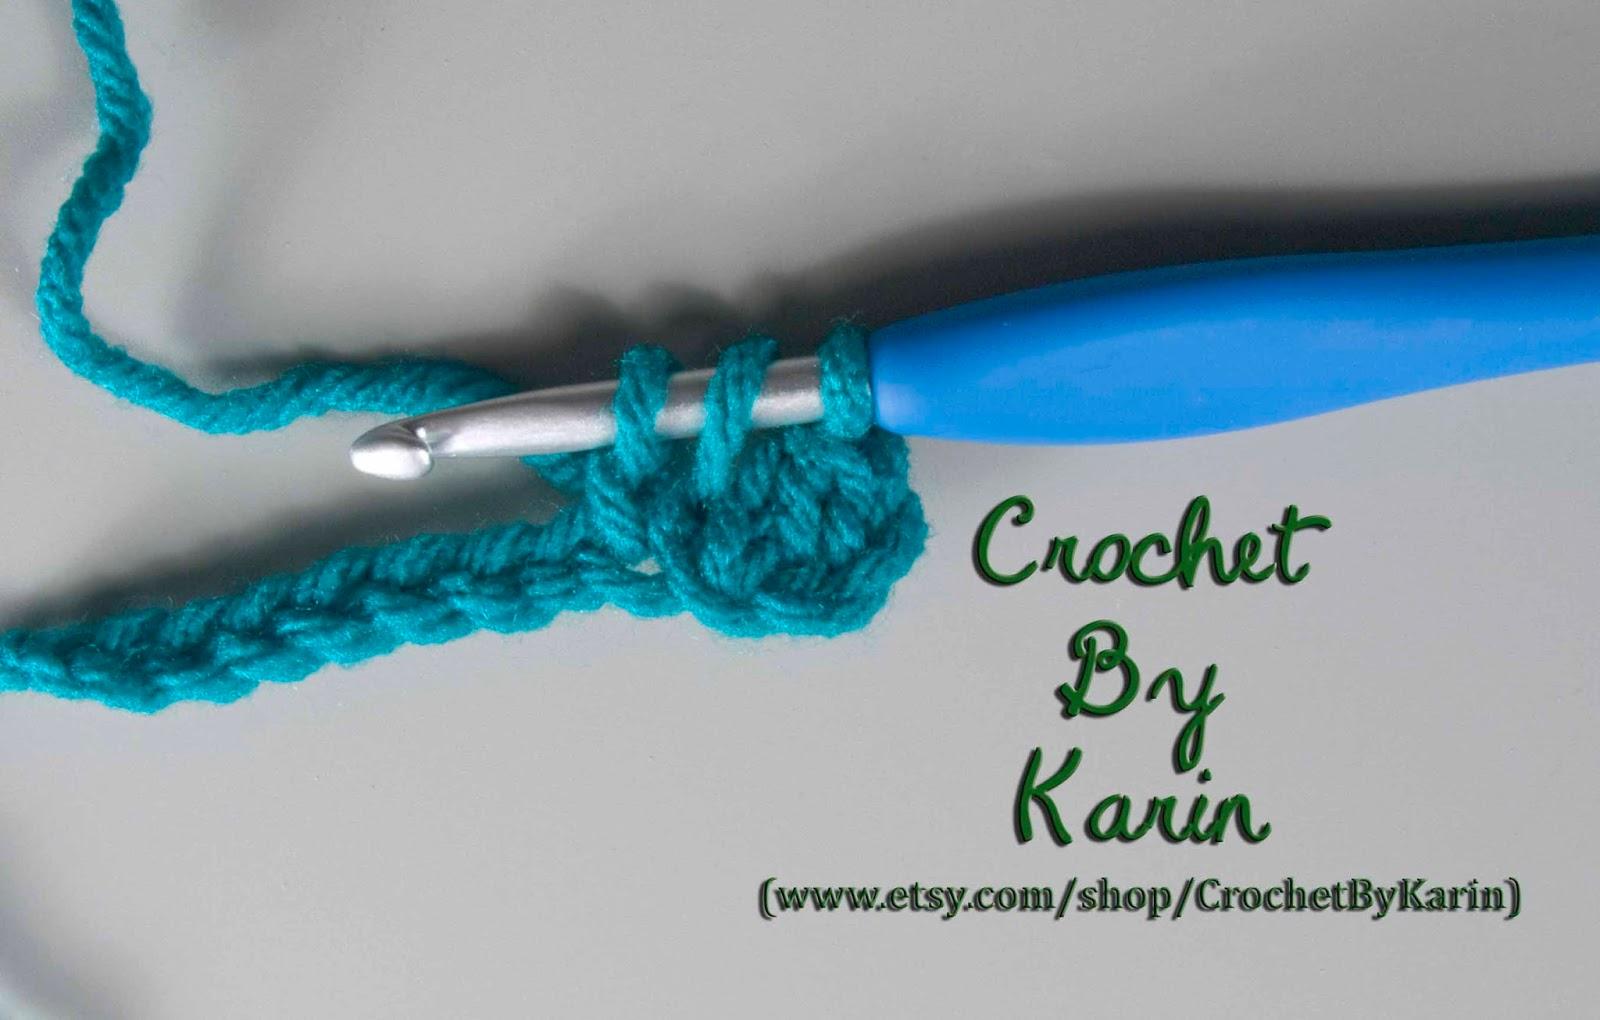 Crochet Stitch Edc : CrochetByKarin: Extended Double Crochet